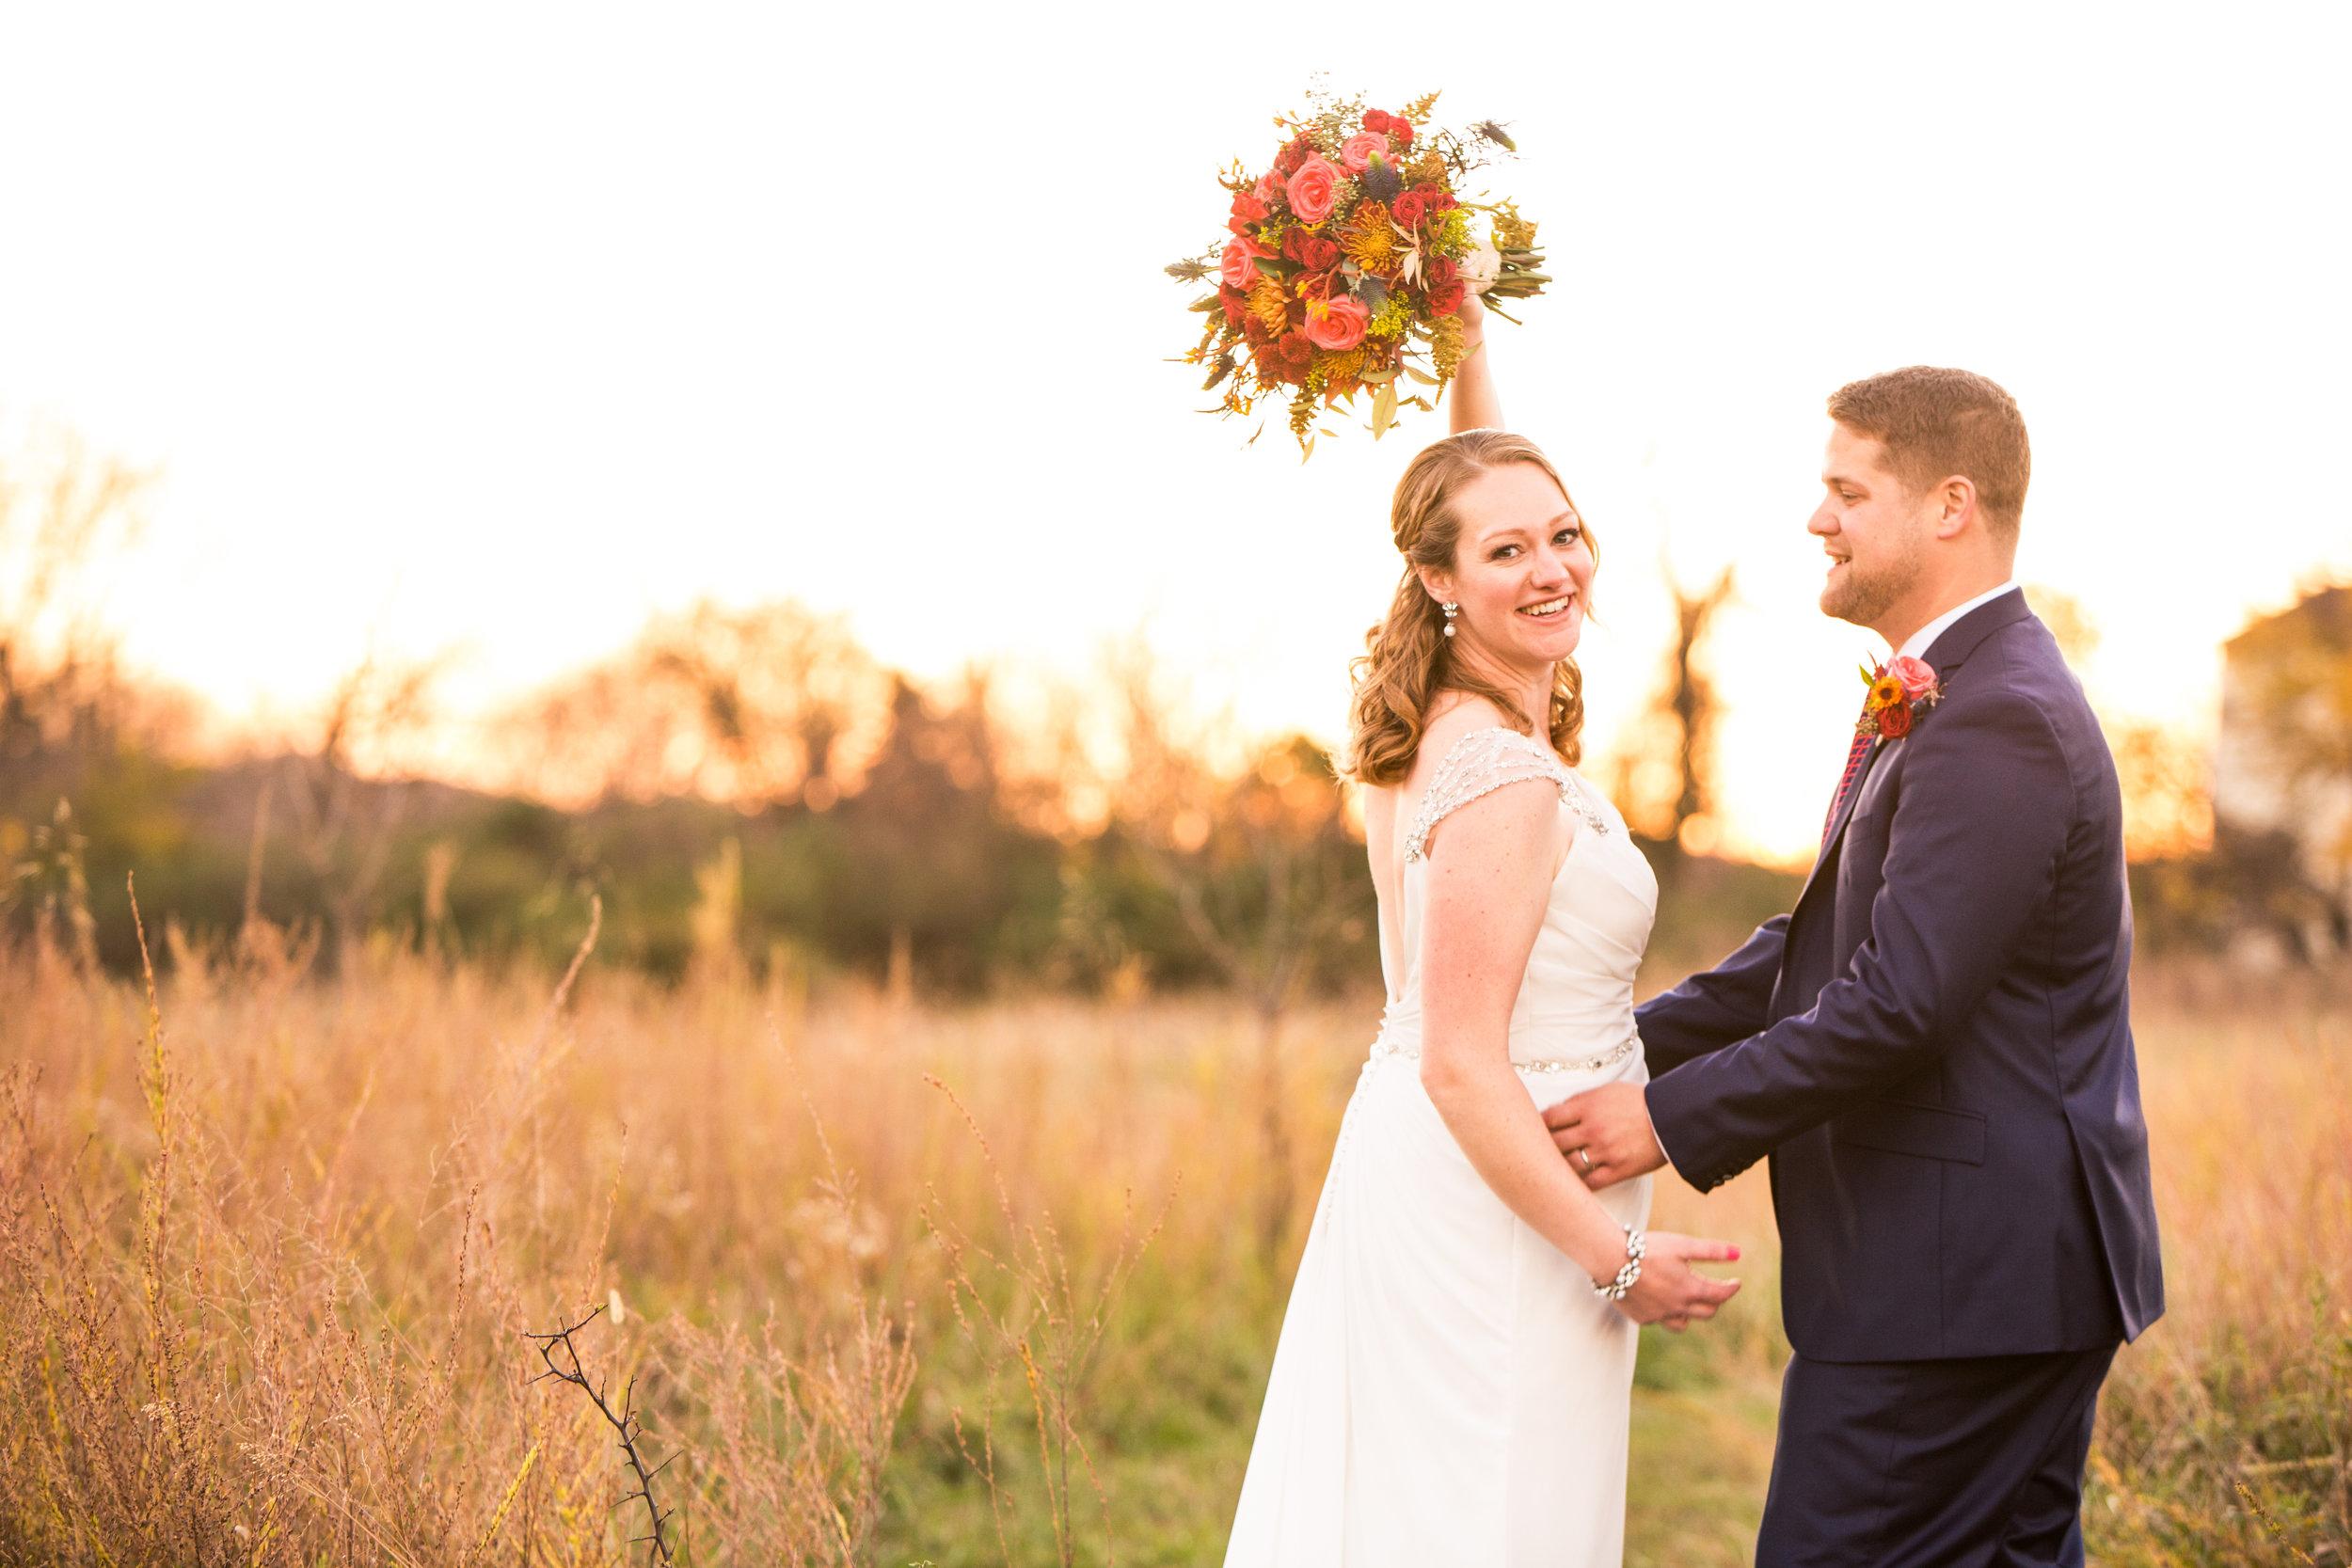 Rust Manor Wedding with flowers by Lark Floral in Leesburg, VA